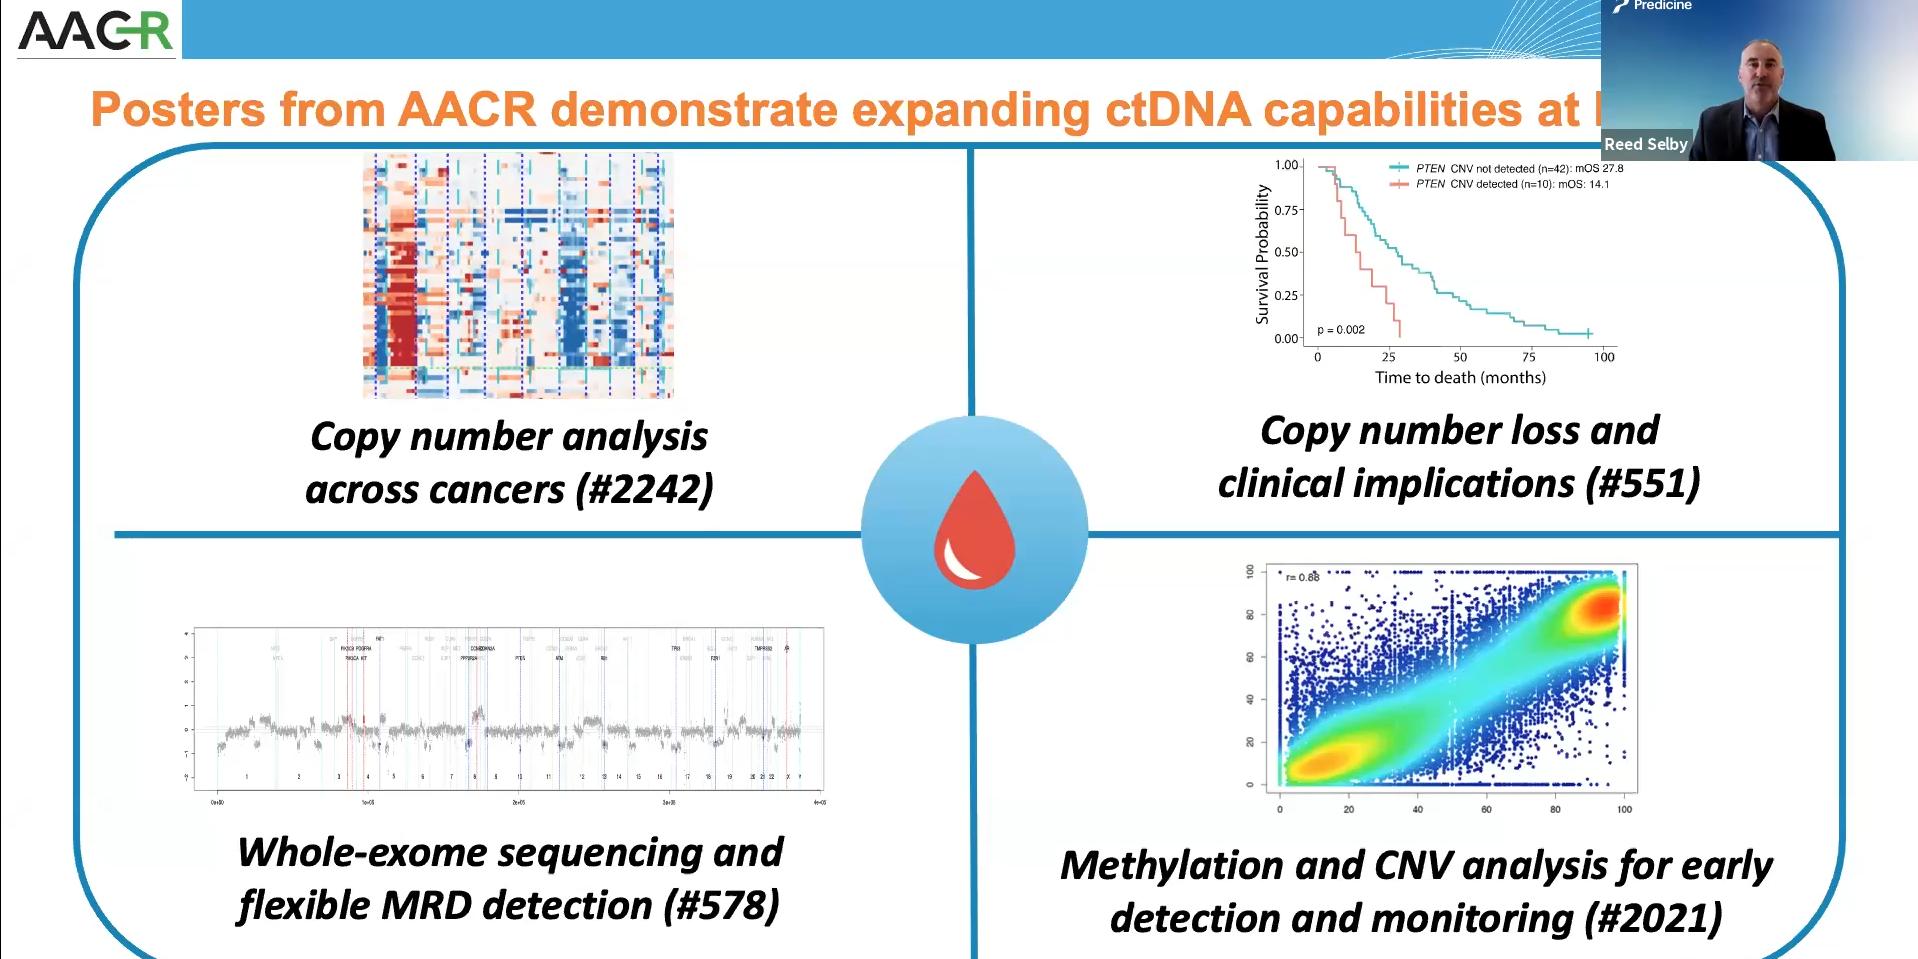 AACR Recap: Updates in Liquid Biopsy MRD and Methylation